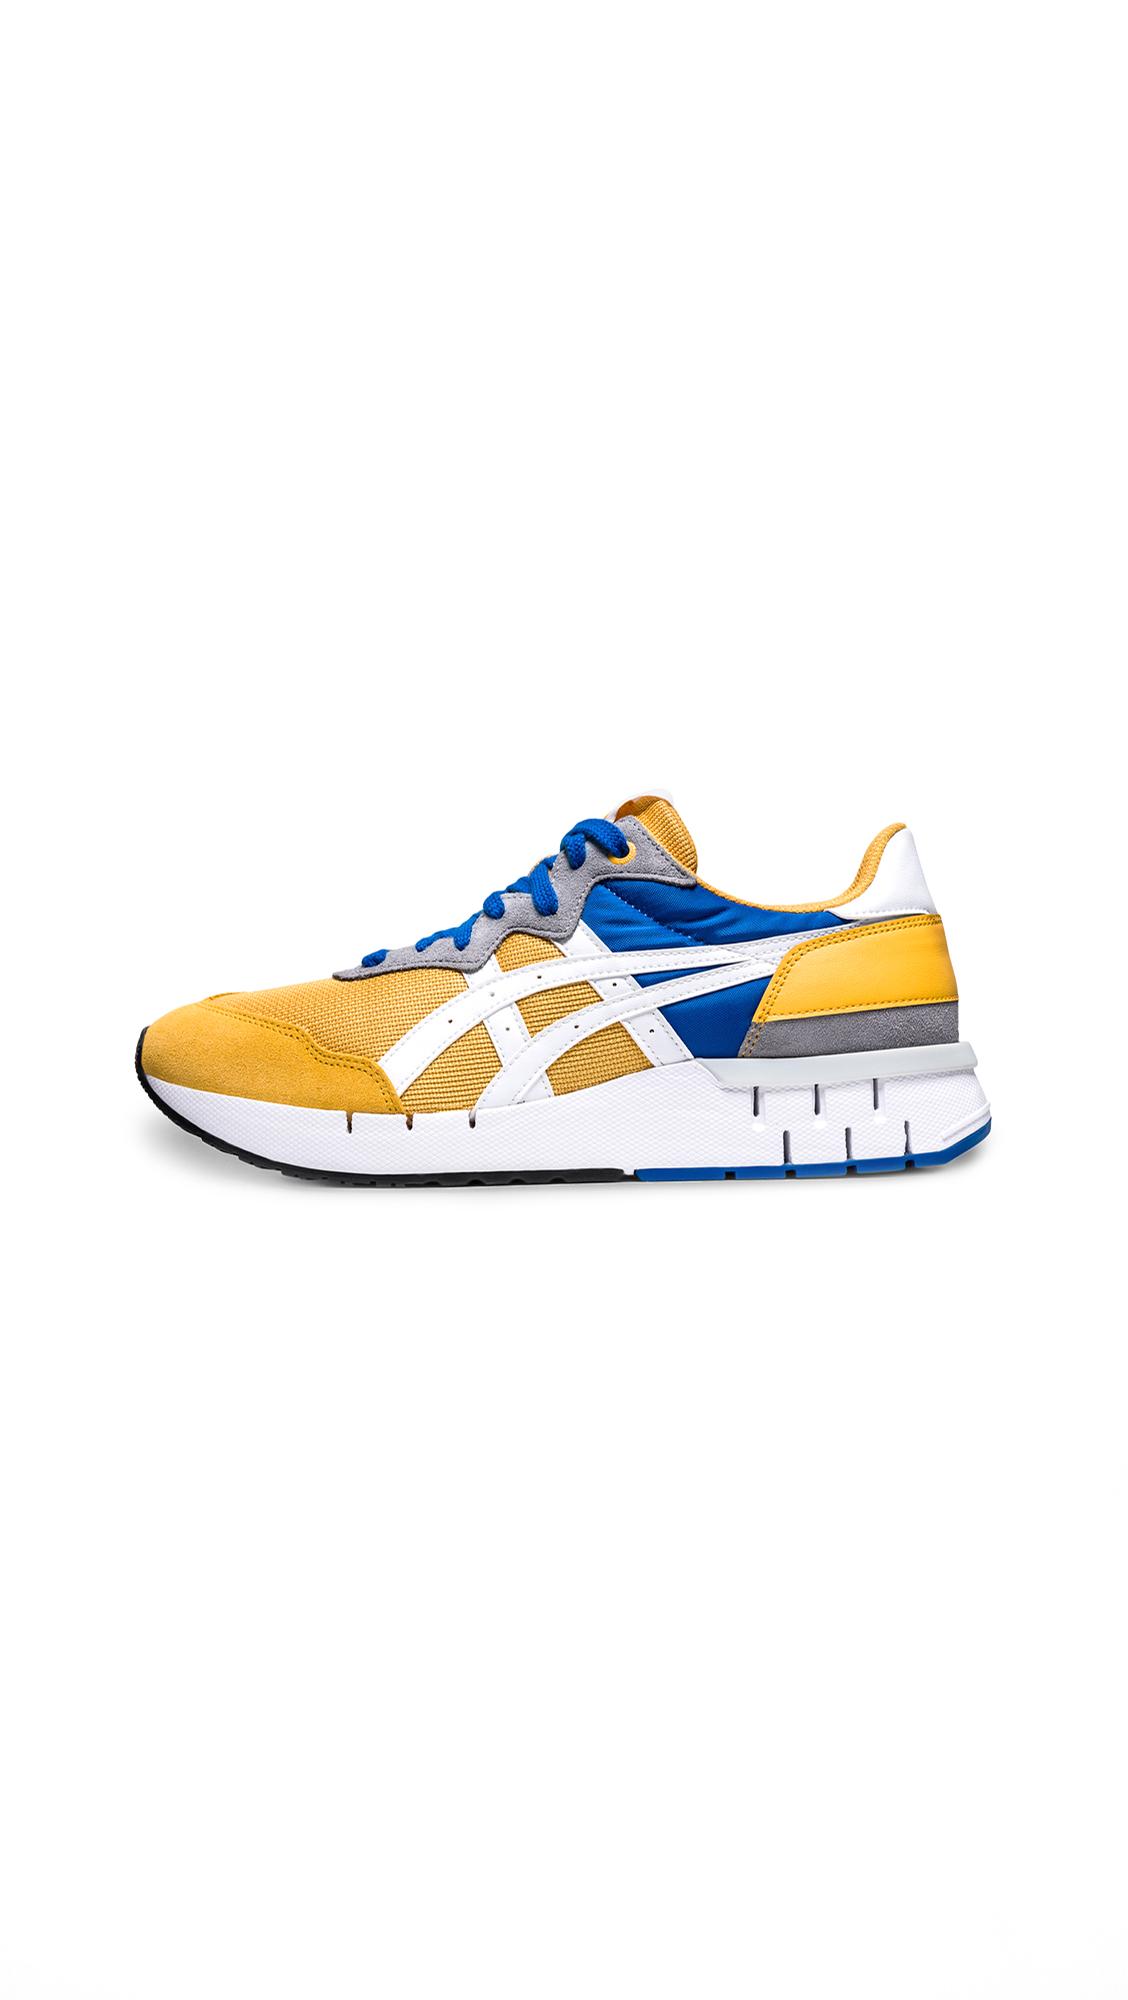 Onitsuka Tiger Rebilac Runner Sneakers - 25% Off Sale